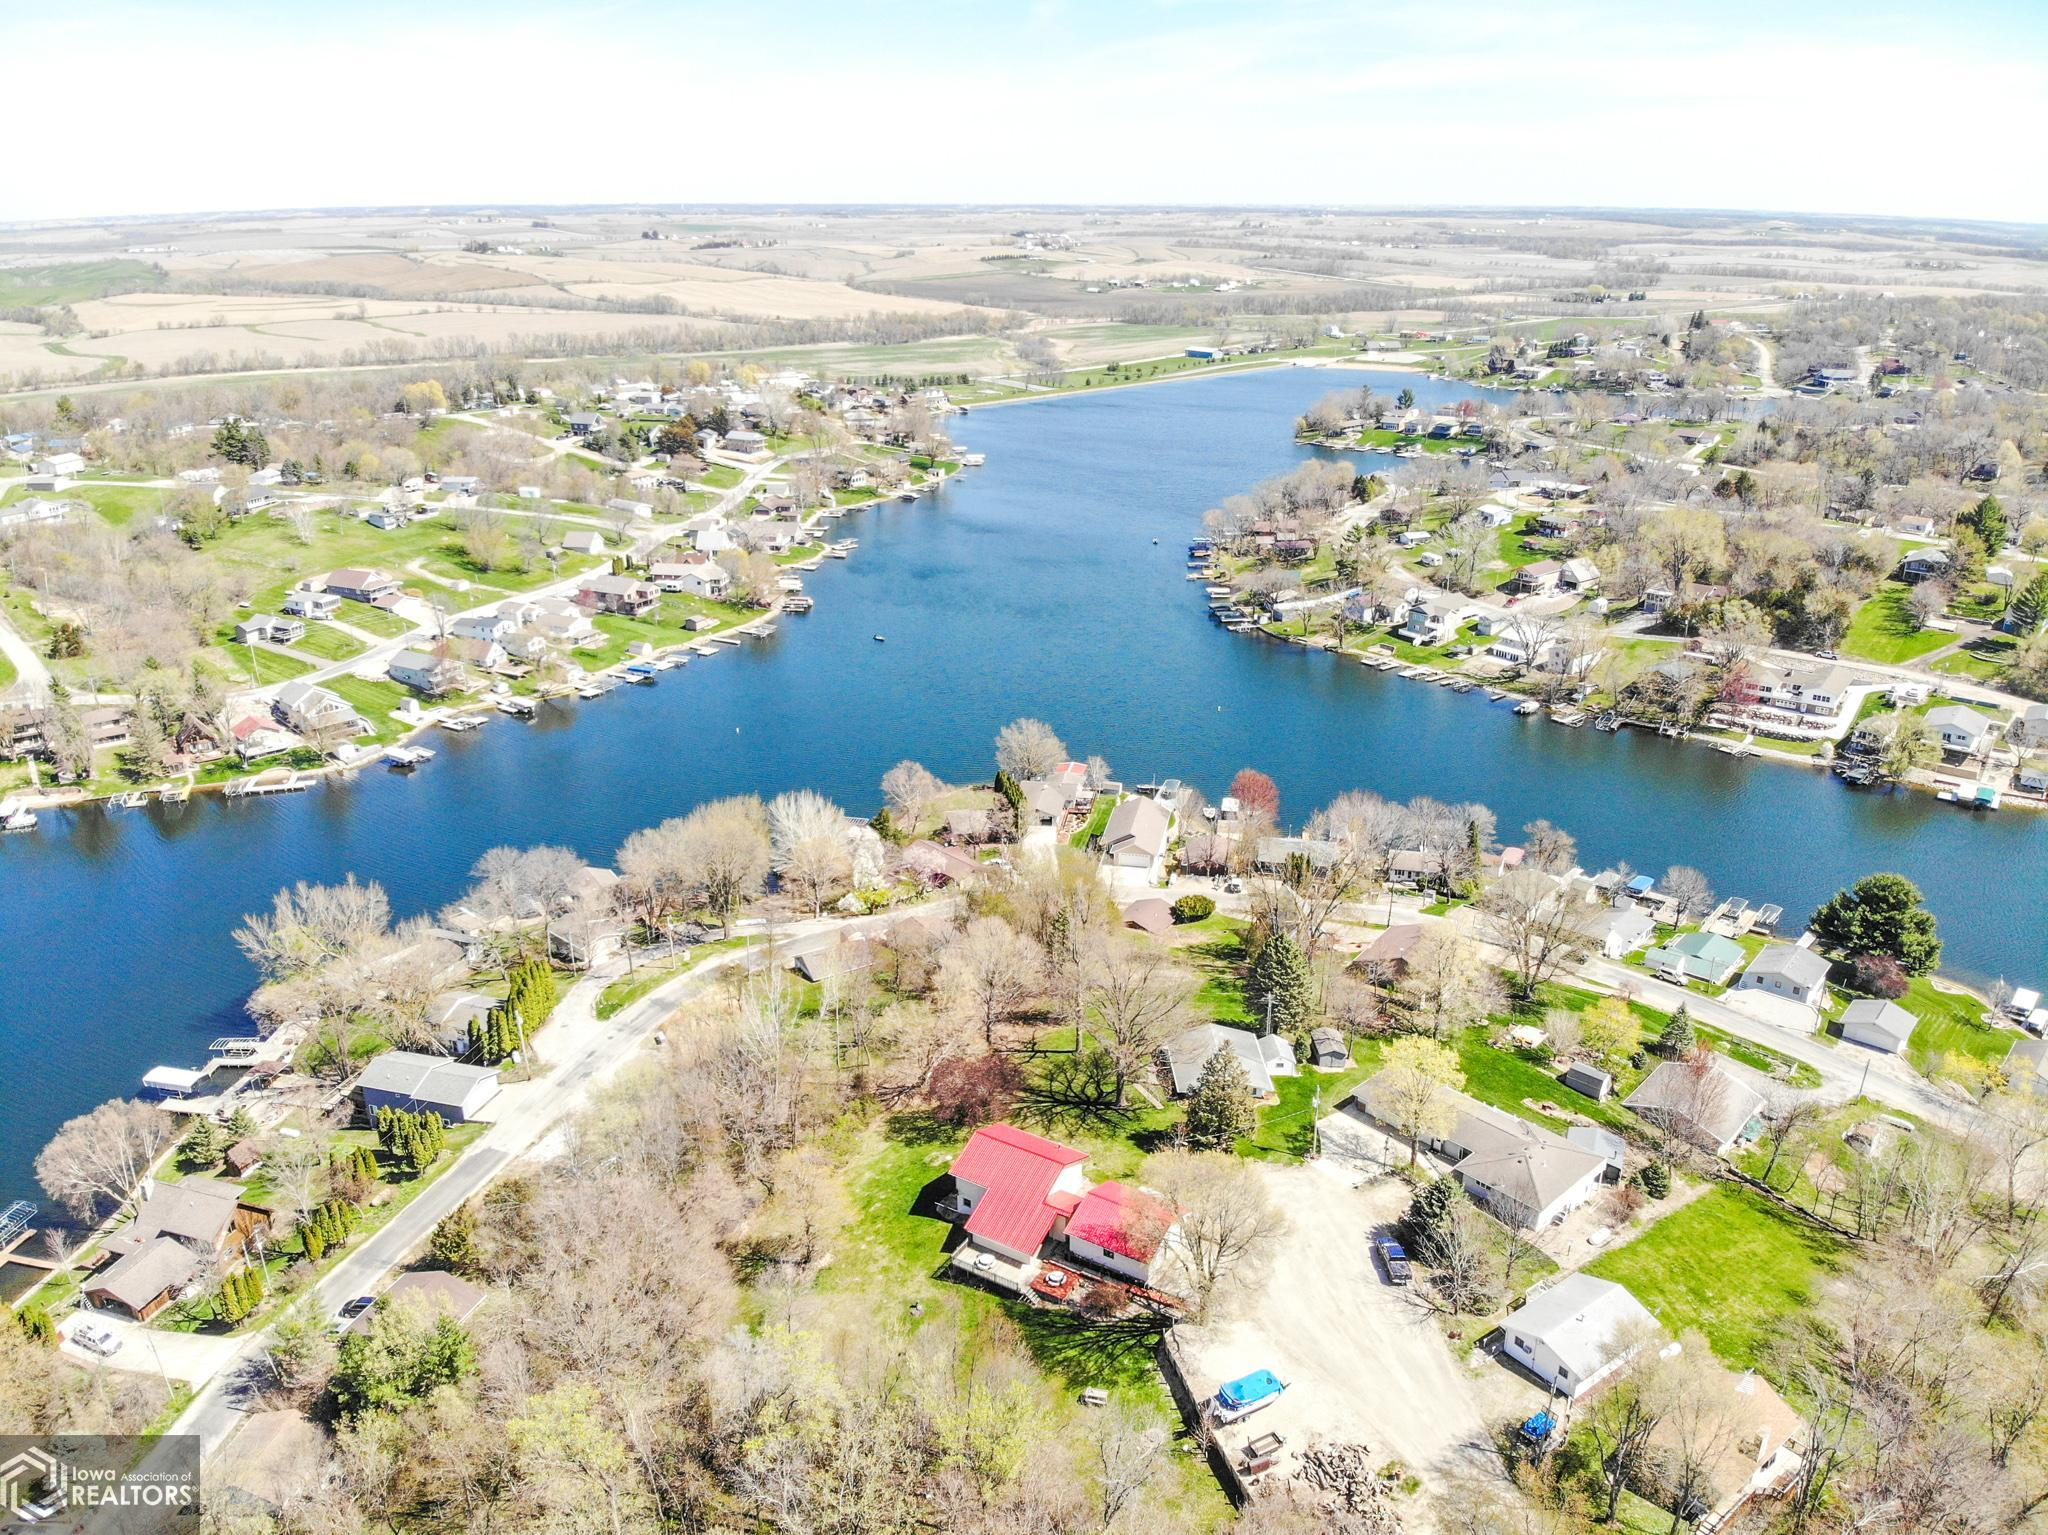 2187 Highview, Brooklyn, Iowa 52211-9535, 3 Bedrooms Bedrooms, ,1 BathroomBathrooms,Single Family,For Sale,Highview,5721053